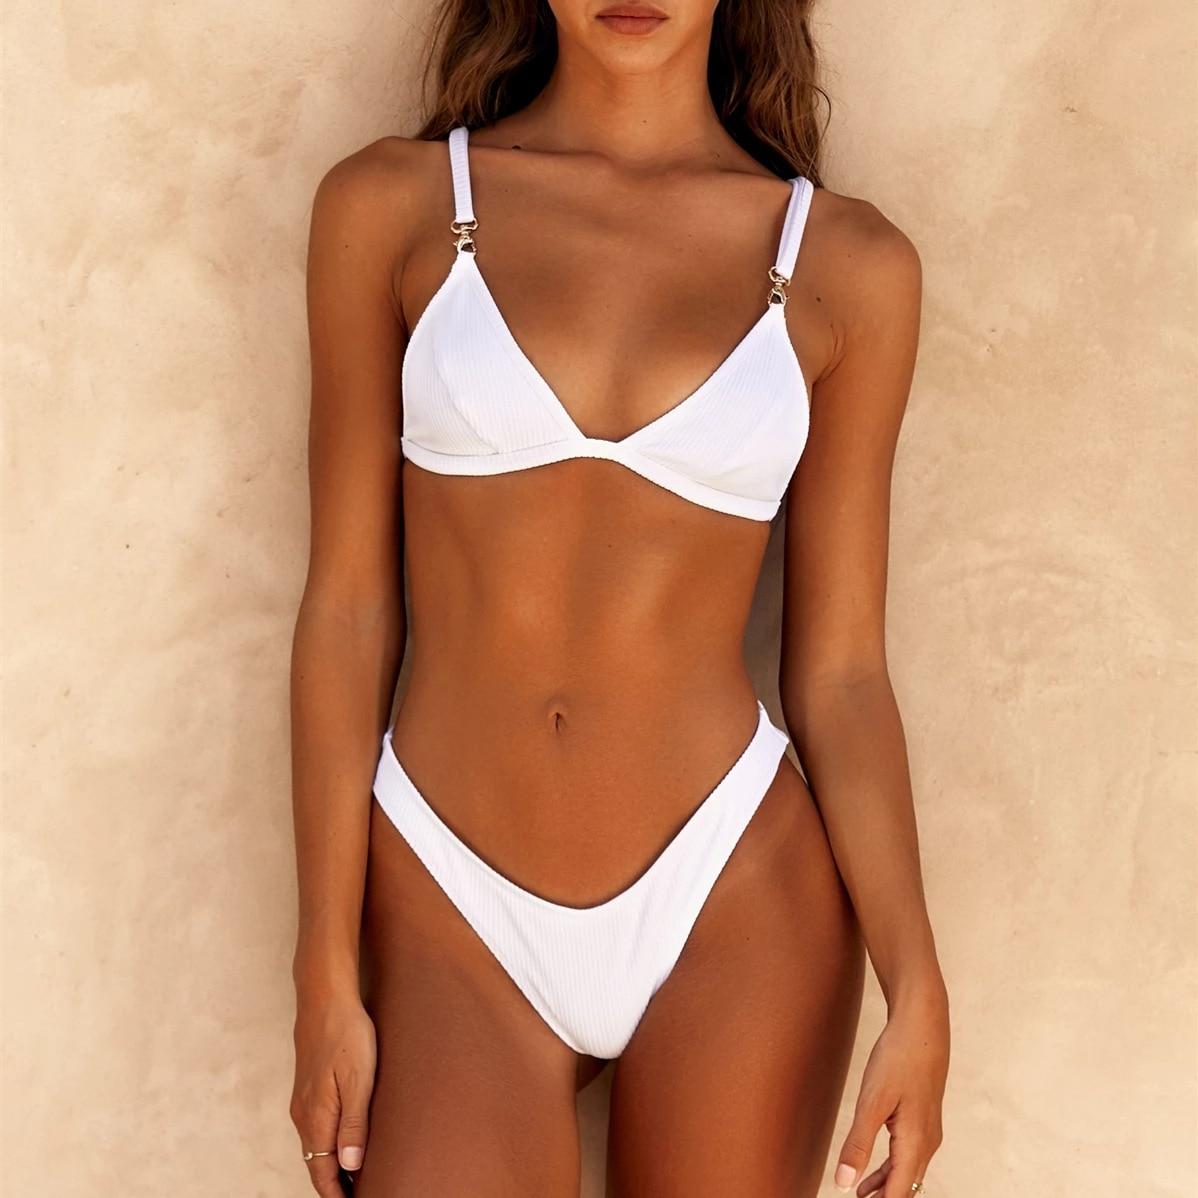 2020 Sexy White Bikini Swimwear Women Swimsuit Brazilian Bikini Set Halter Top Beach Wear Bathing Suits Biquini High Cut Summer